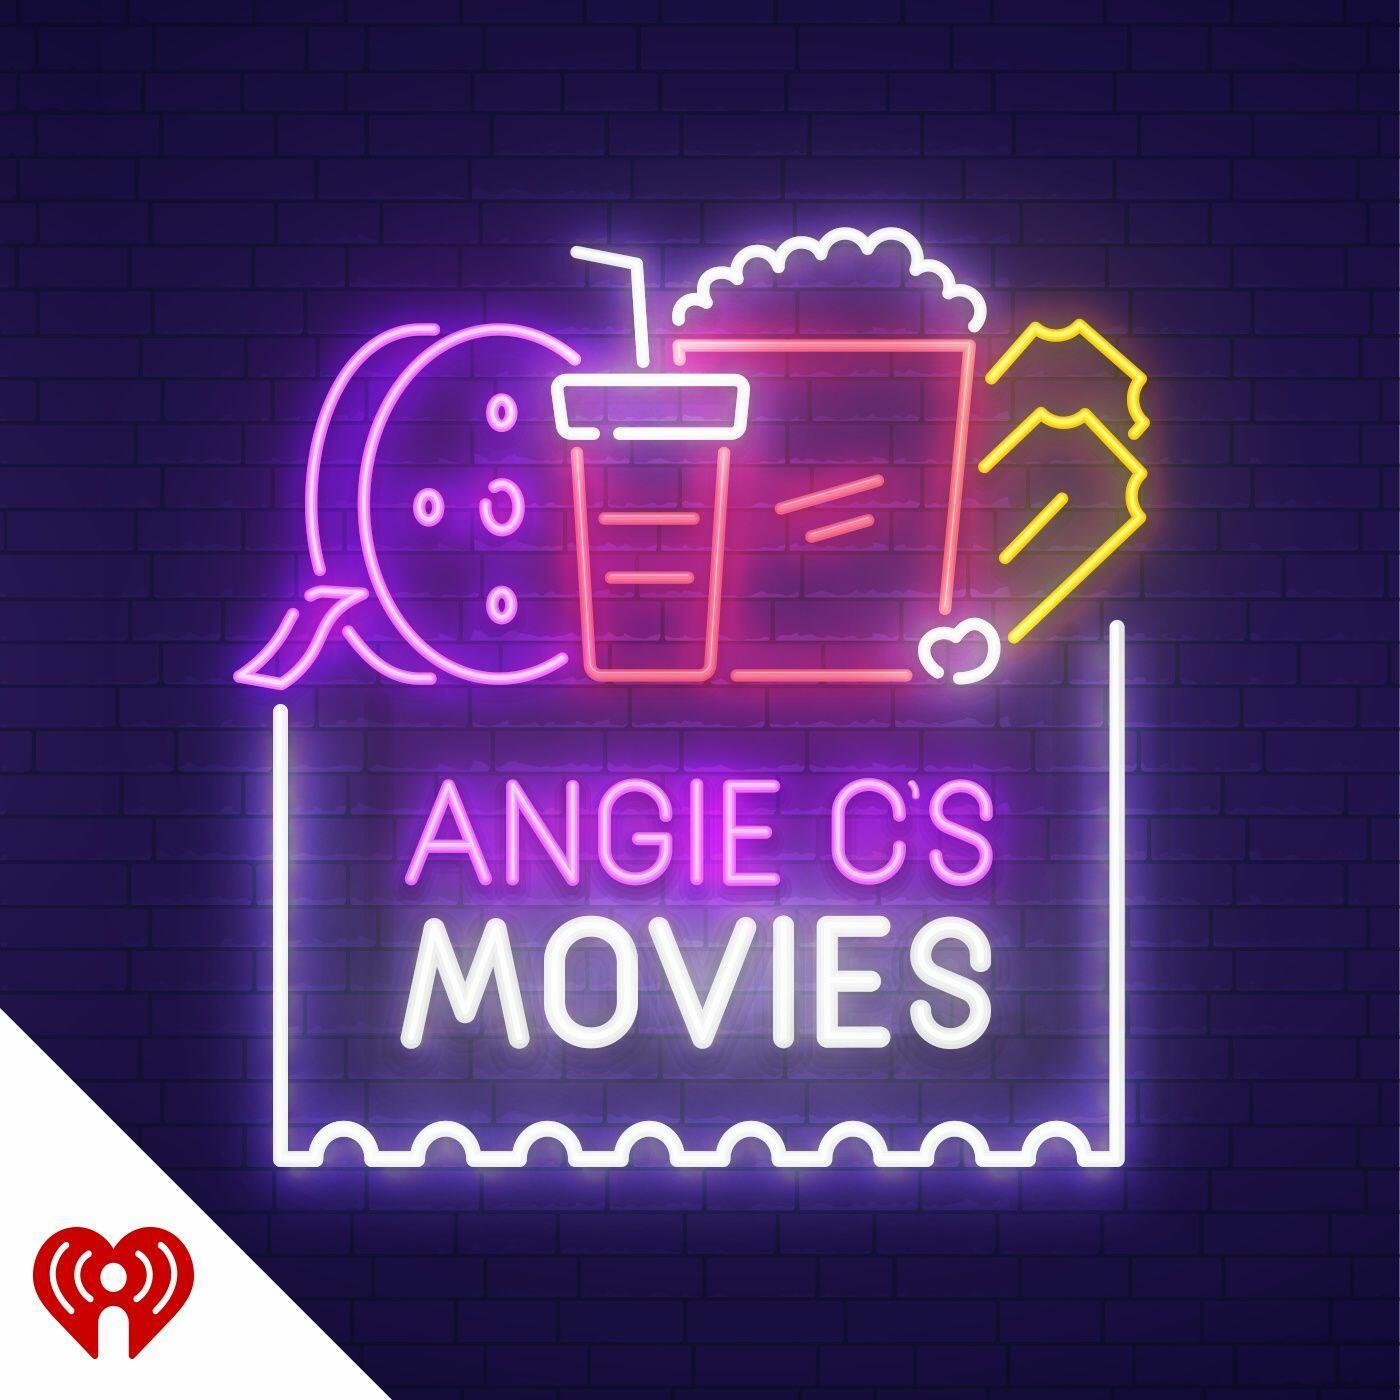 Angie C's Movies